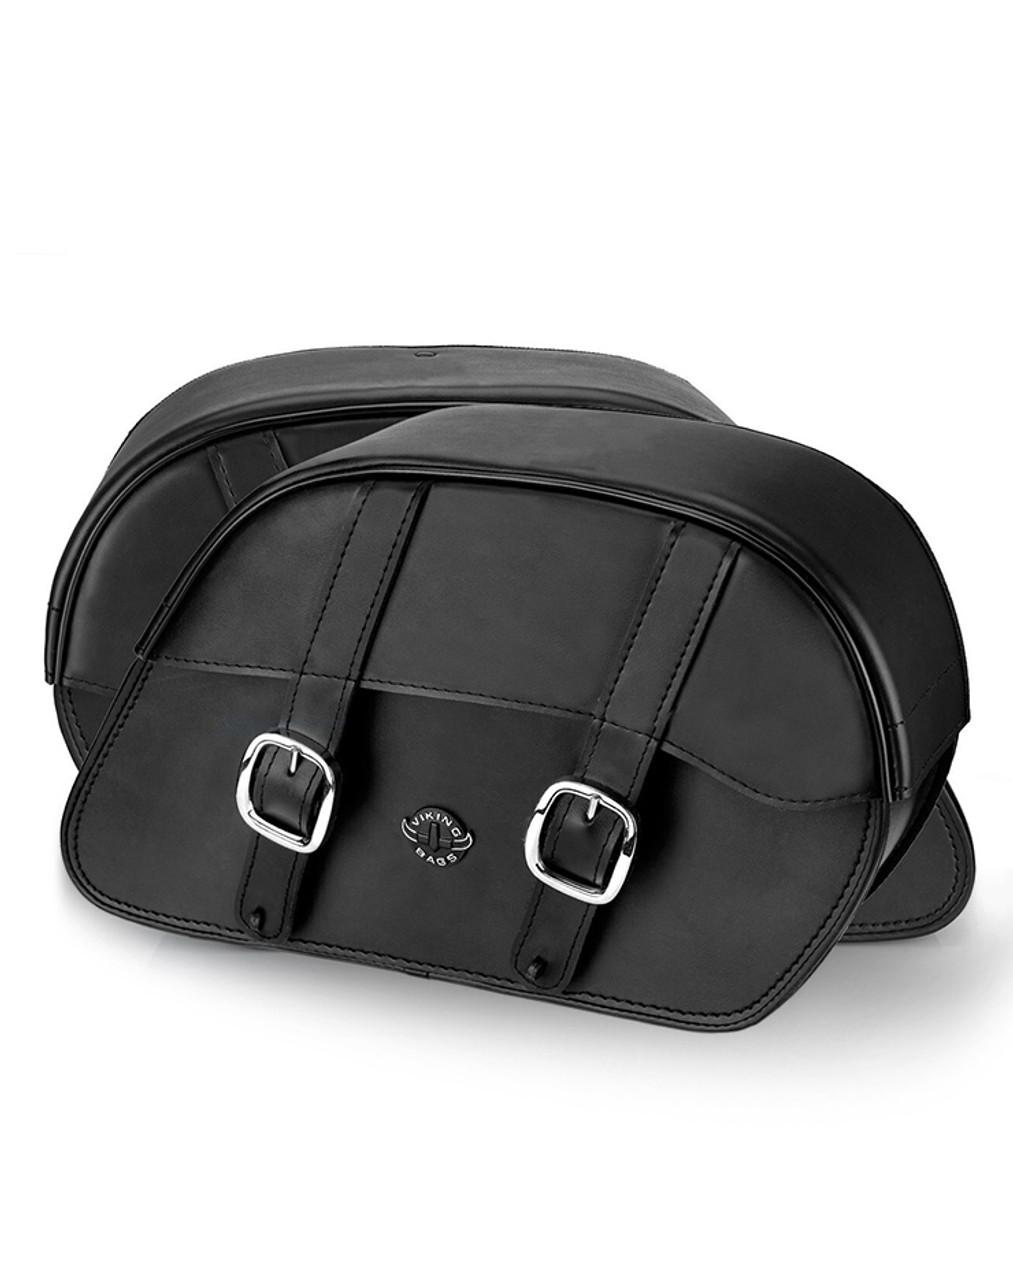 Kawasaki Eliminator 125 Slanted Medium Motorcycle Saddlebags Both Bags View